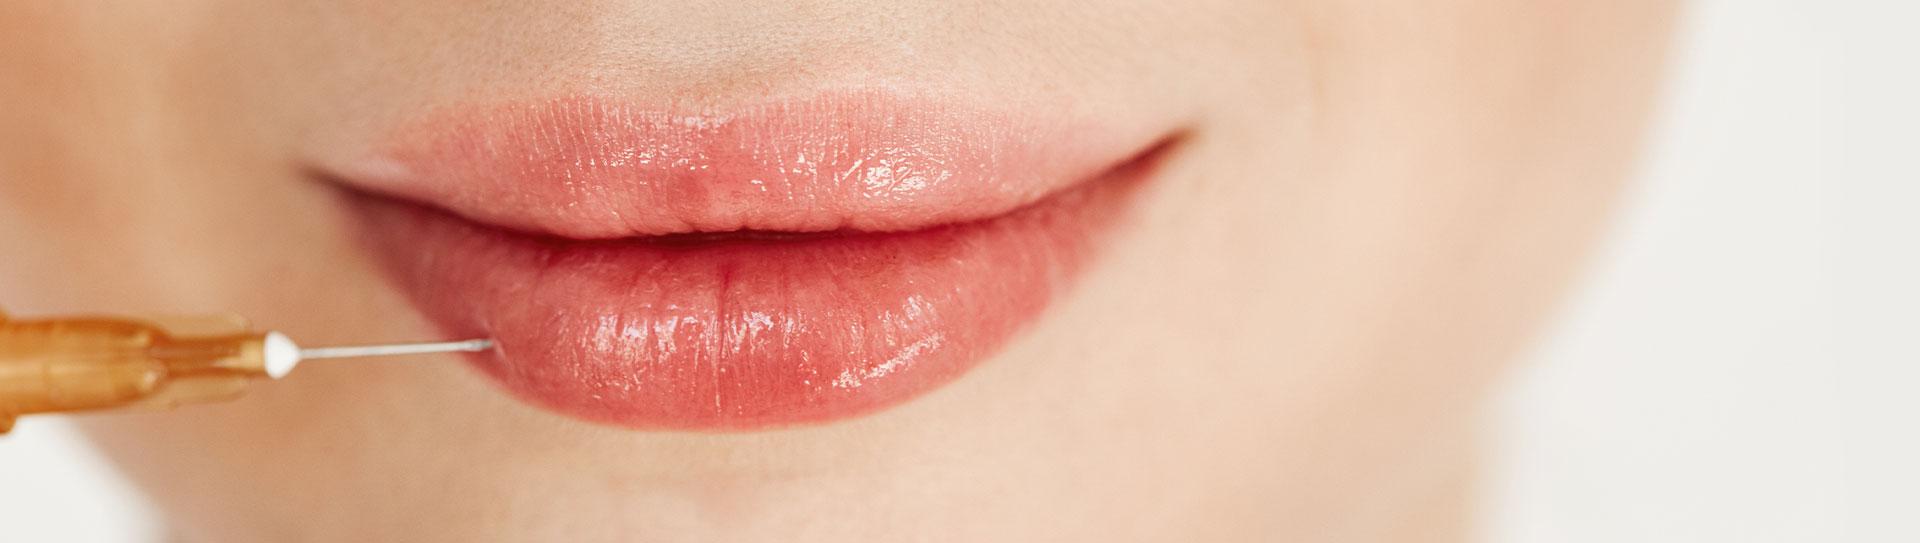 filler labbra, filler mento, filler guancia, filler mascella